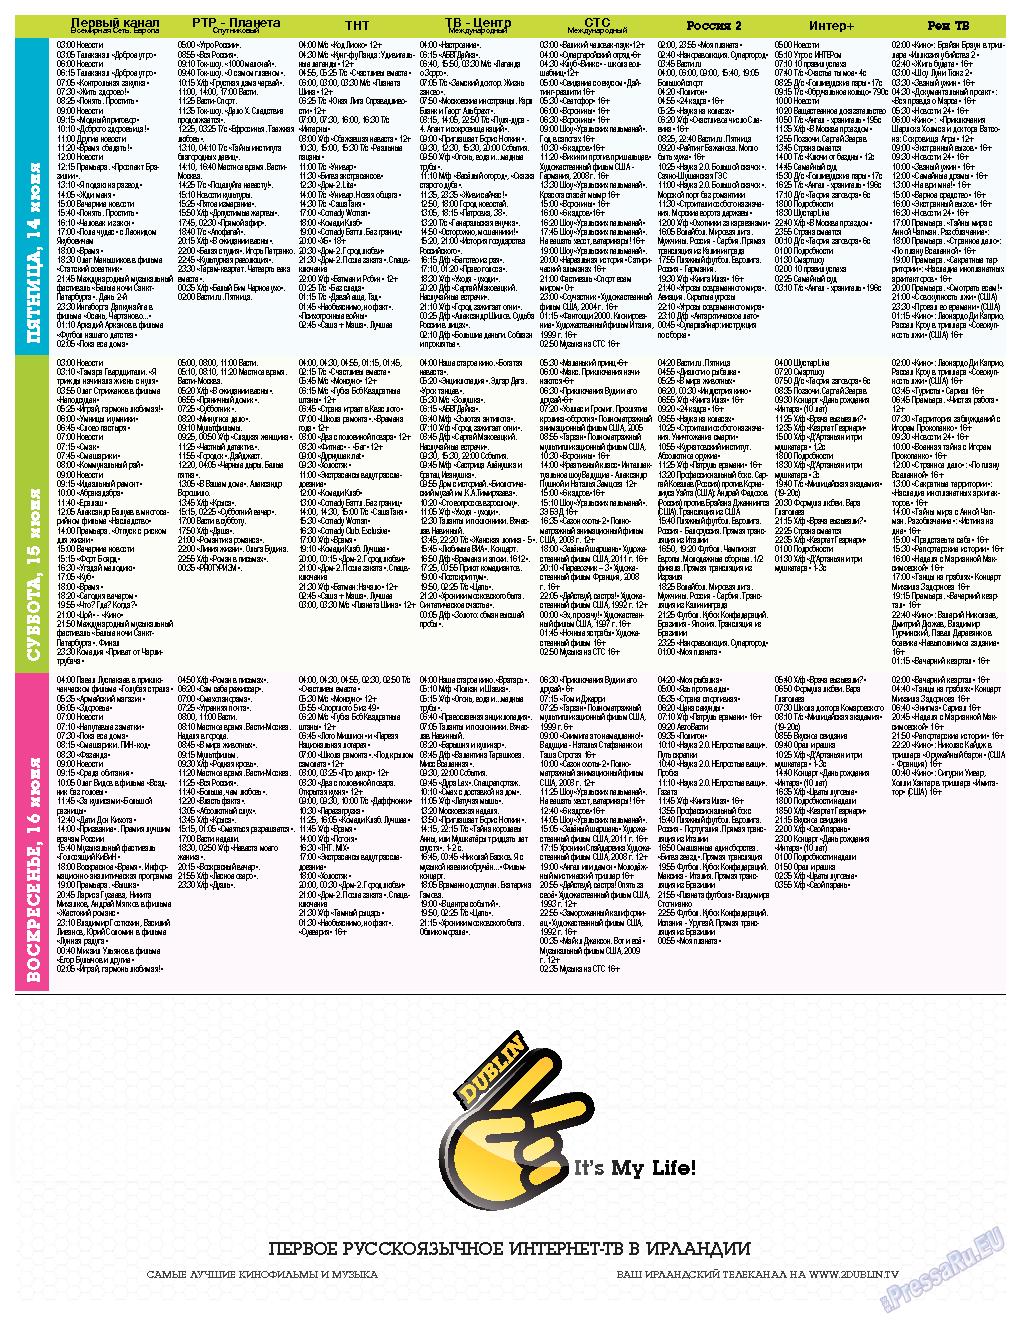 Дублин инфоцентр (газета). 2013 год, номер 21, стр. 9